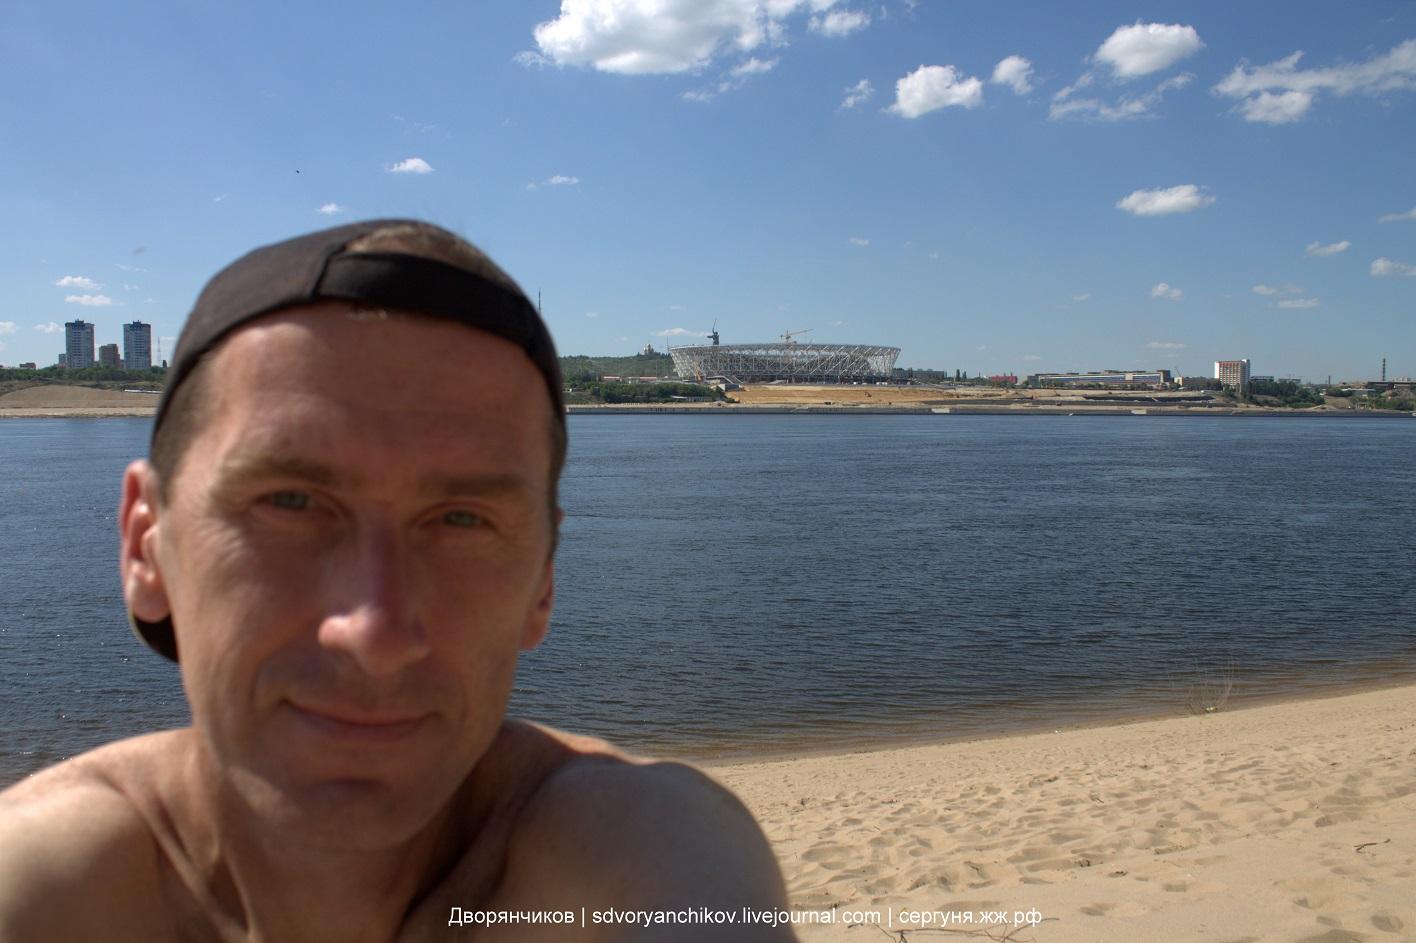 Волгоград - по ту сторону Волги - 8 июня 2017